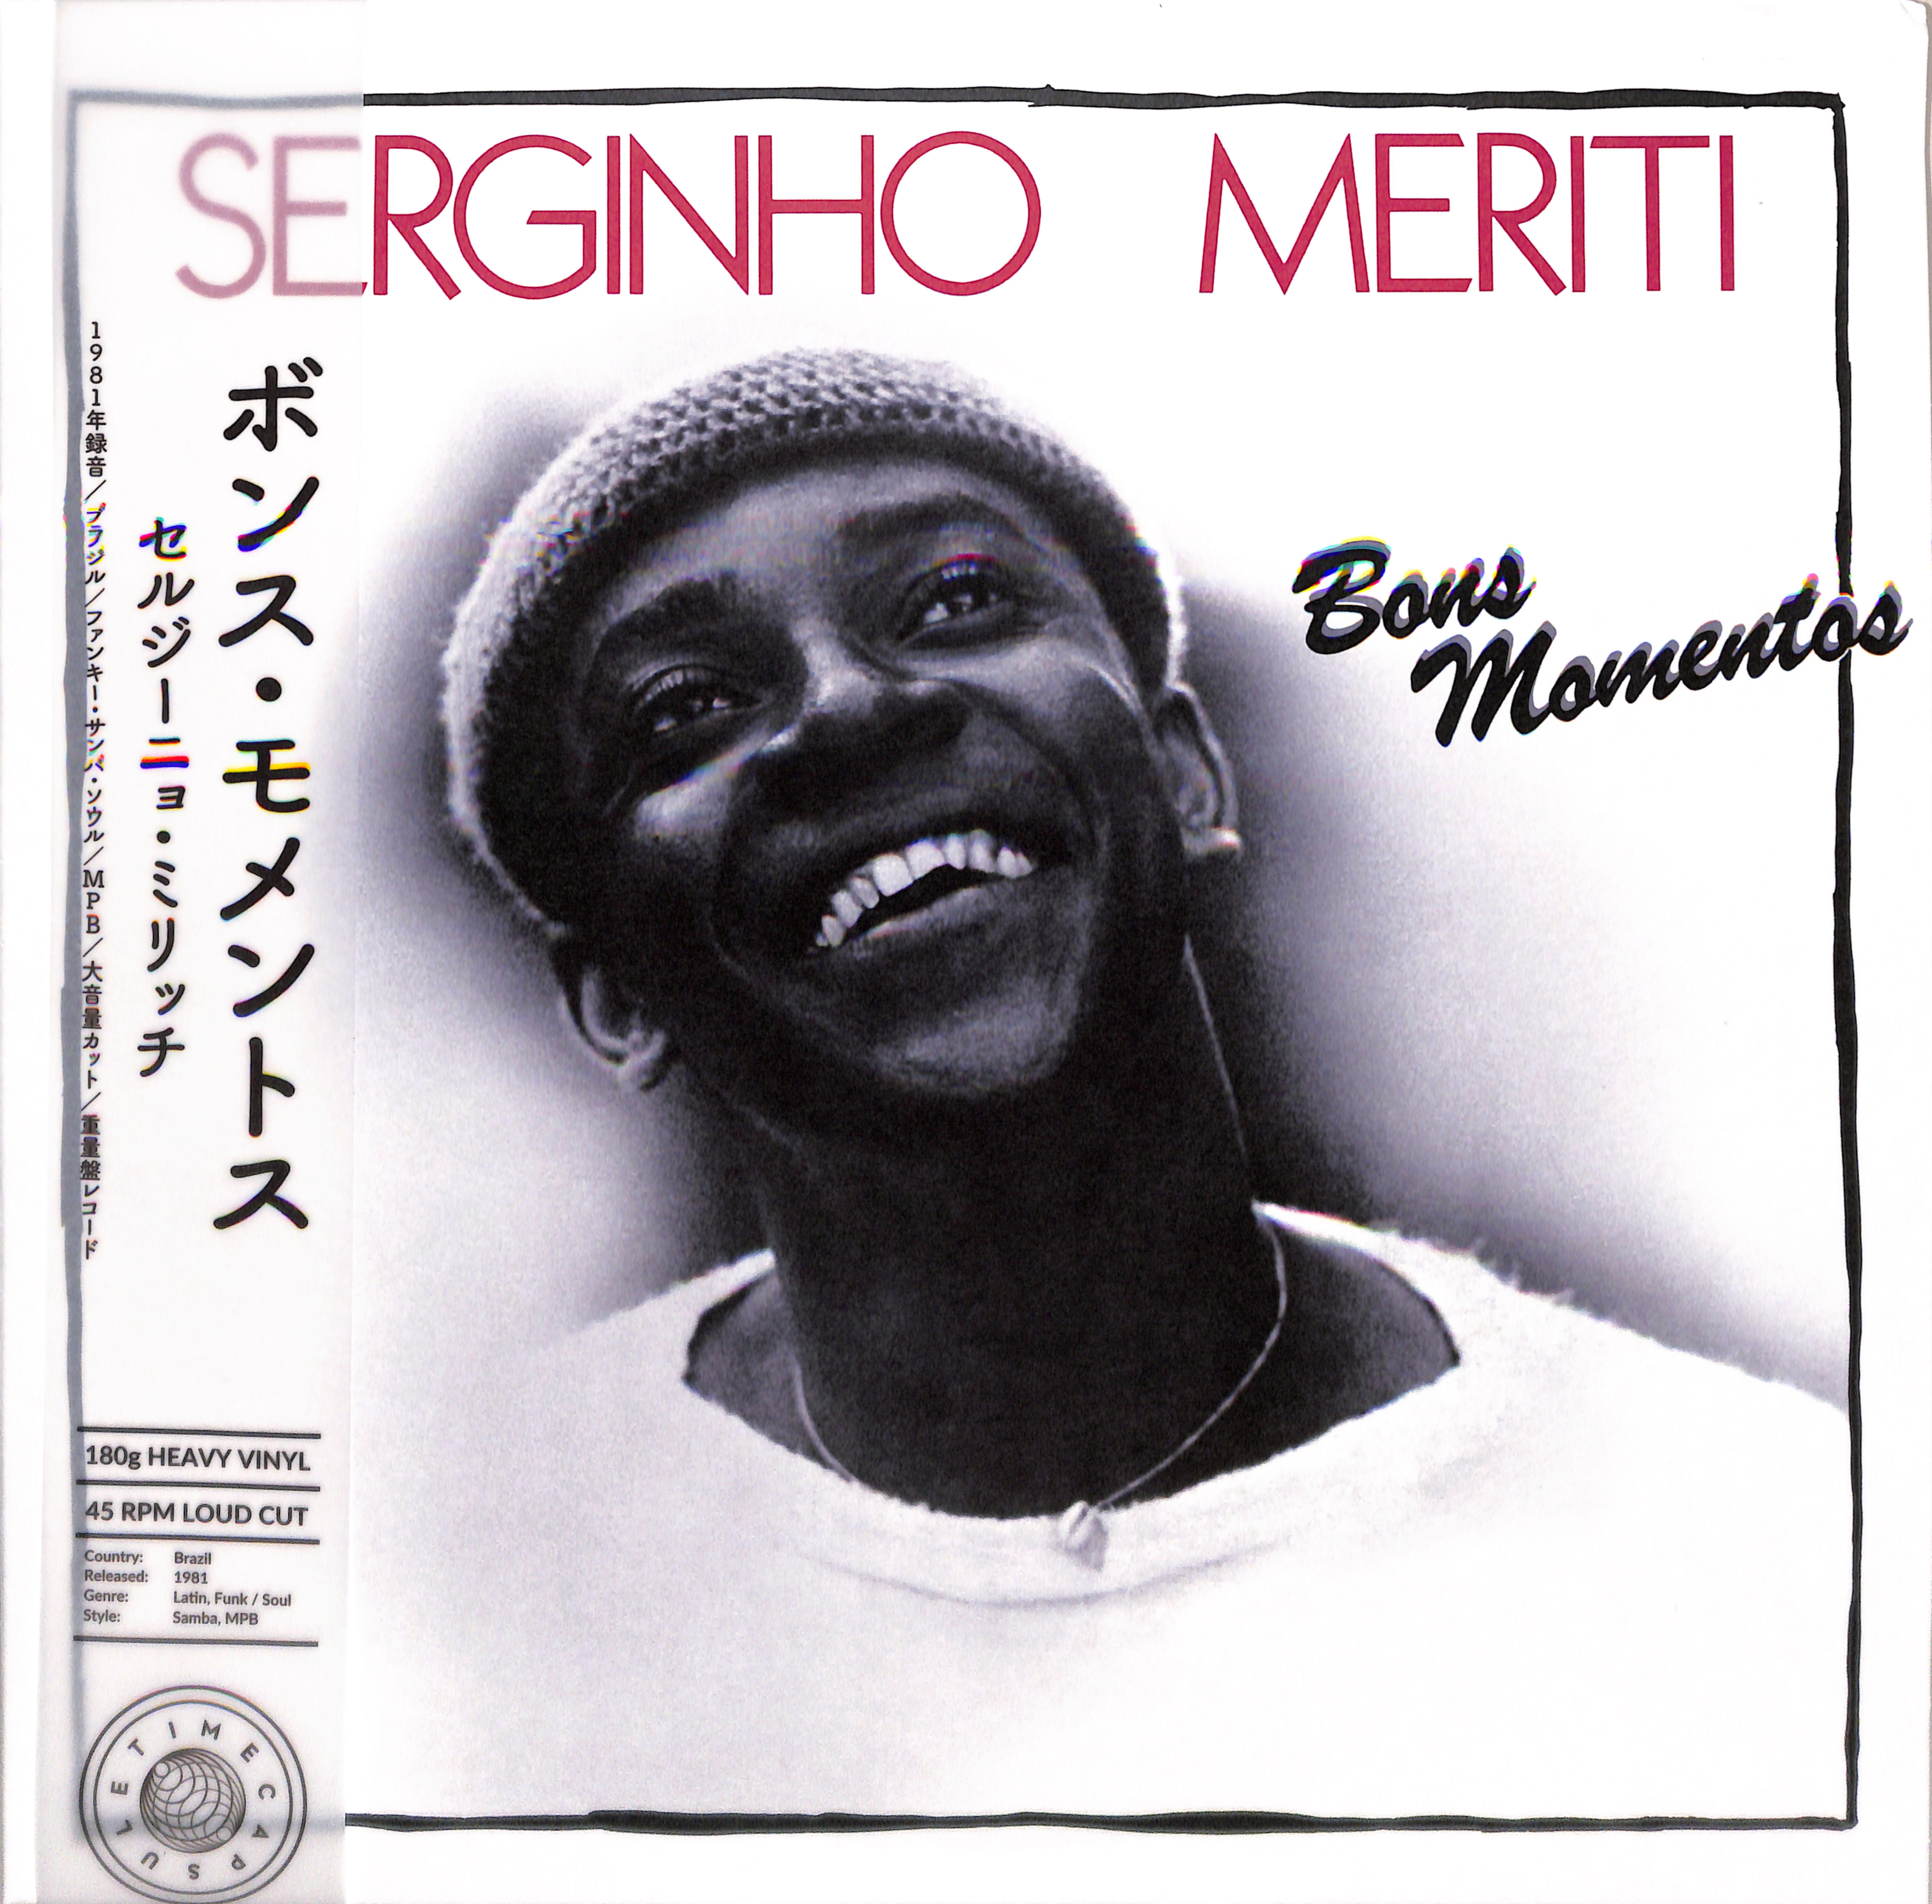 Serginho Meriti - BONS MEMENTOS